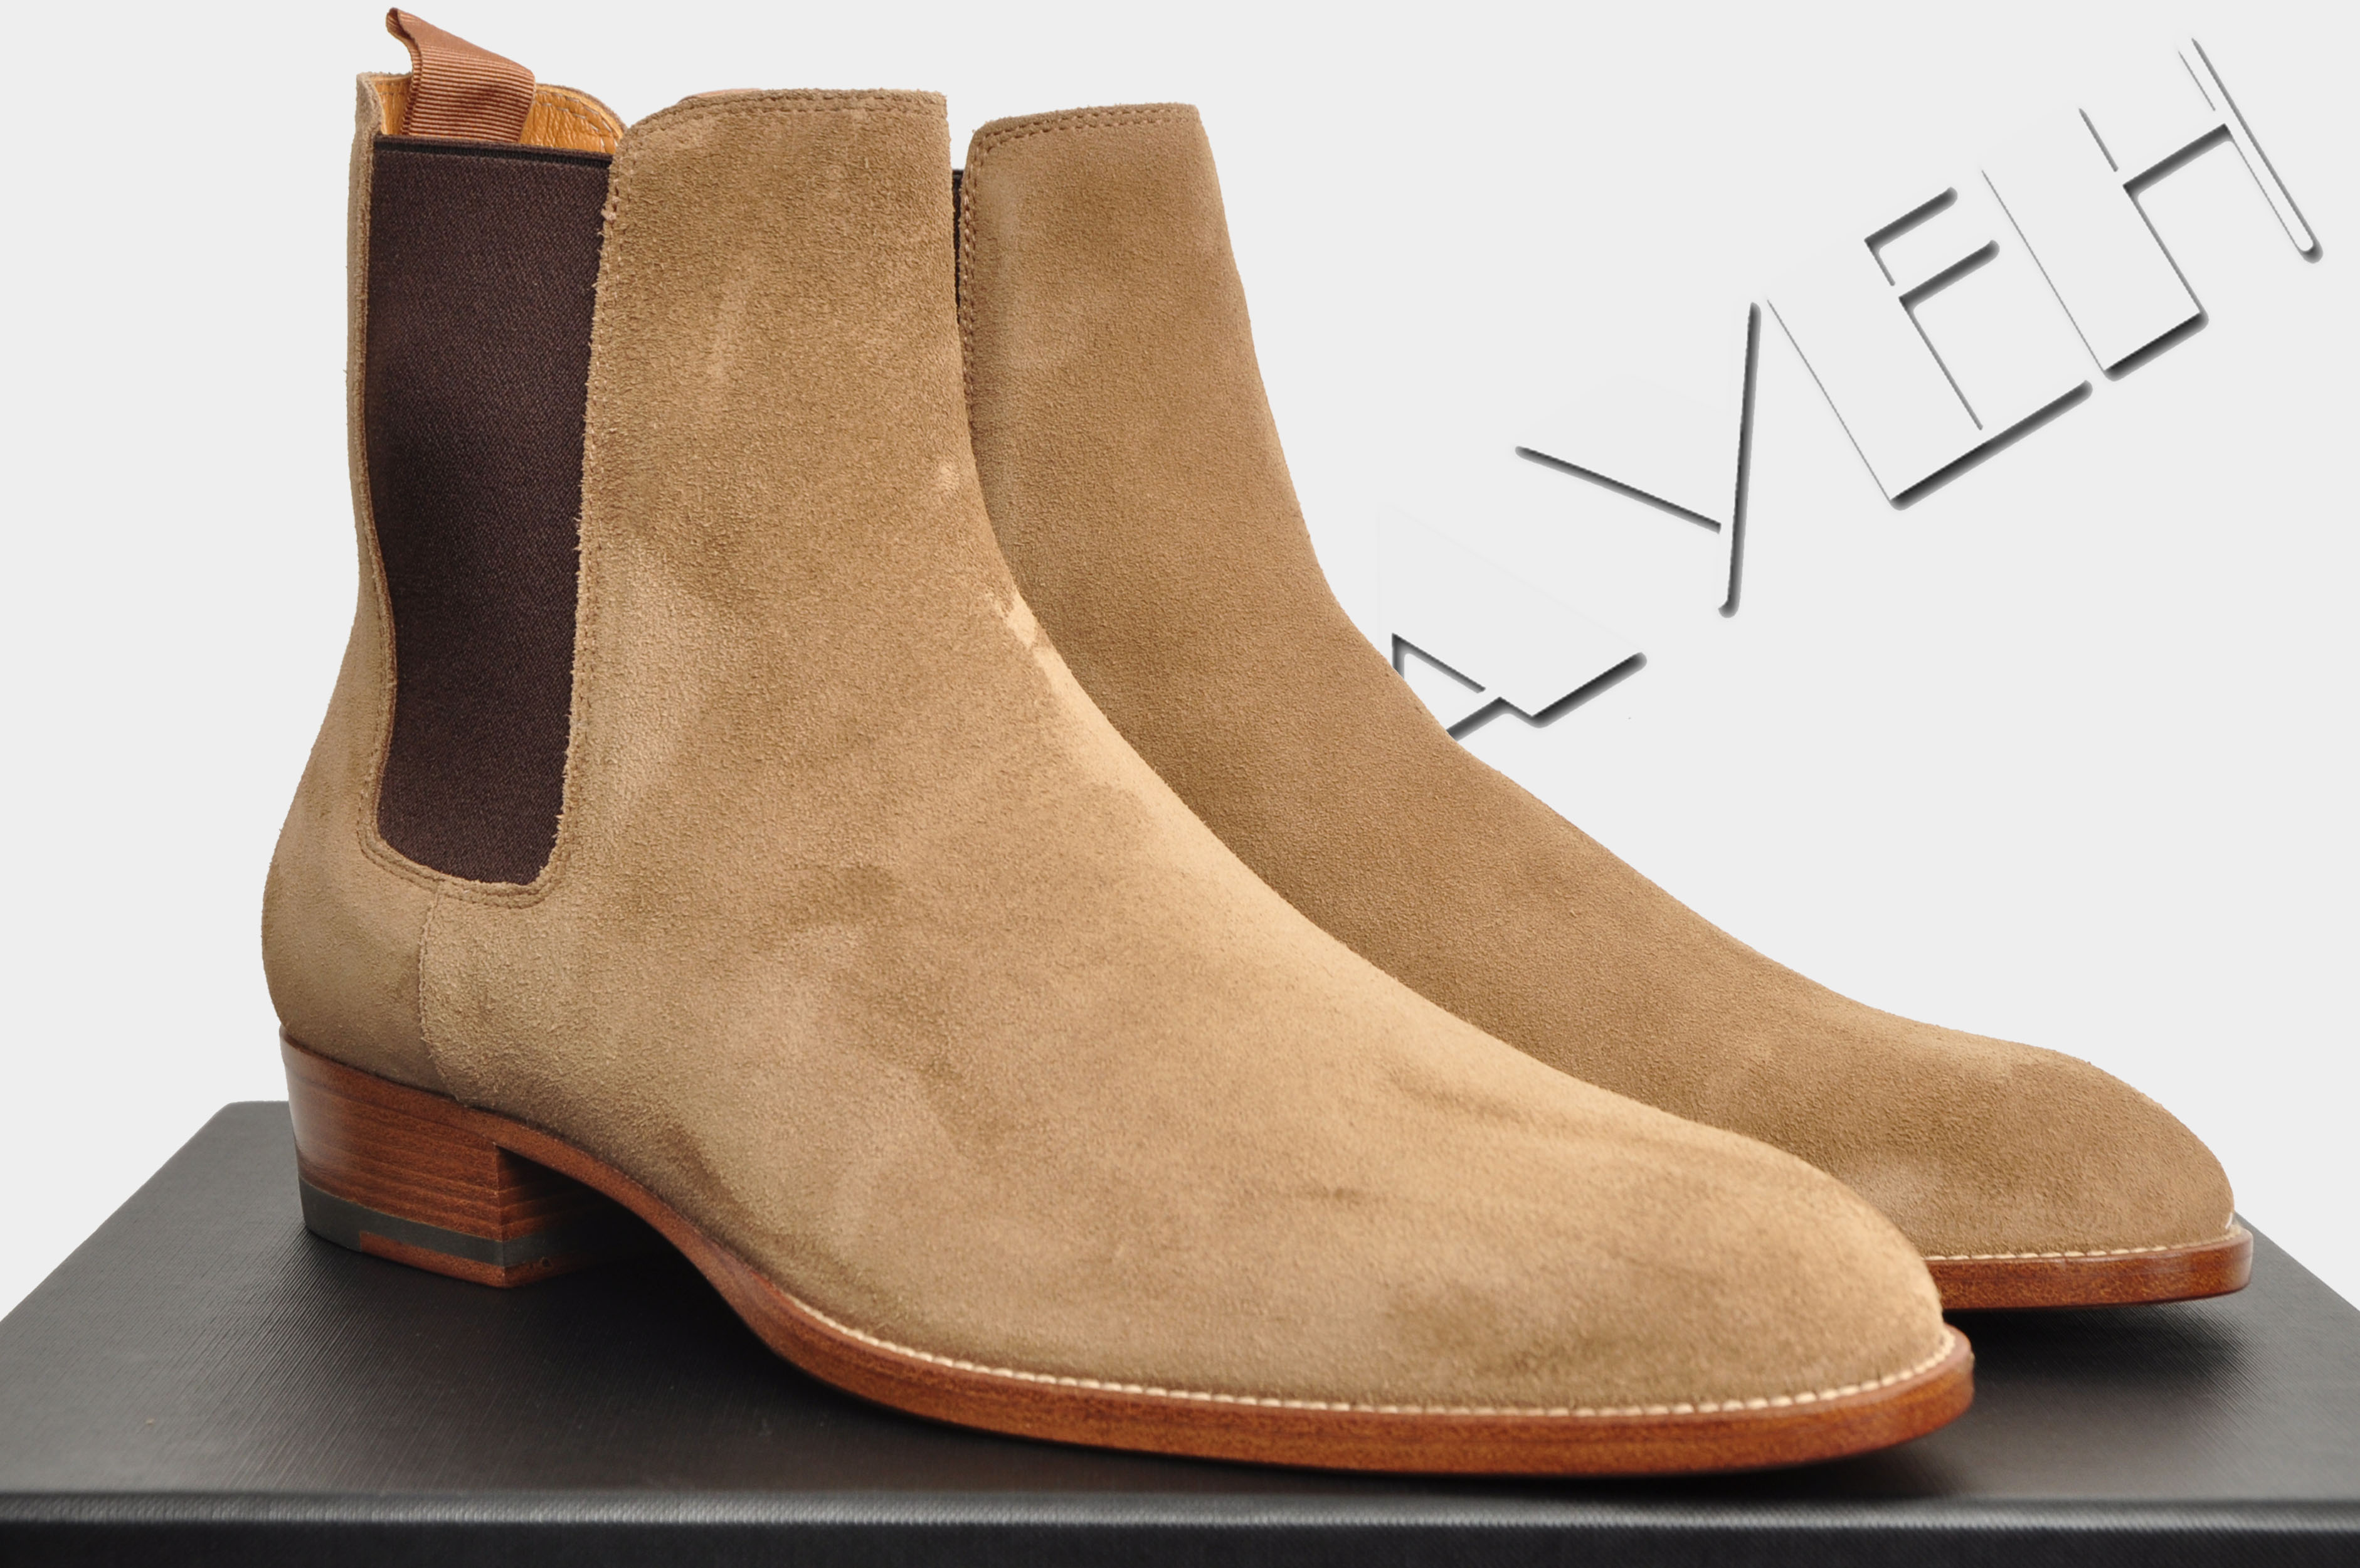 6572612d05b7 Saint Laurent Paris 895  CLASSIC WYATT 30 CHELSEA BOOT IN NEW TOBACCO SUEDE  Size 6 - Boots for Sale - Grailed